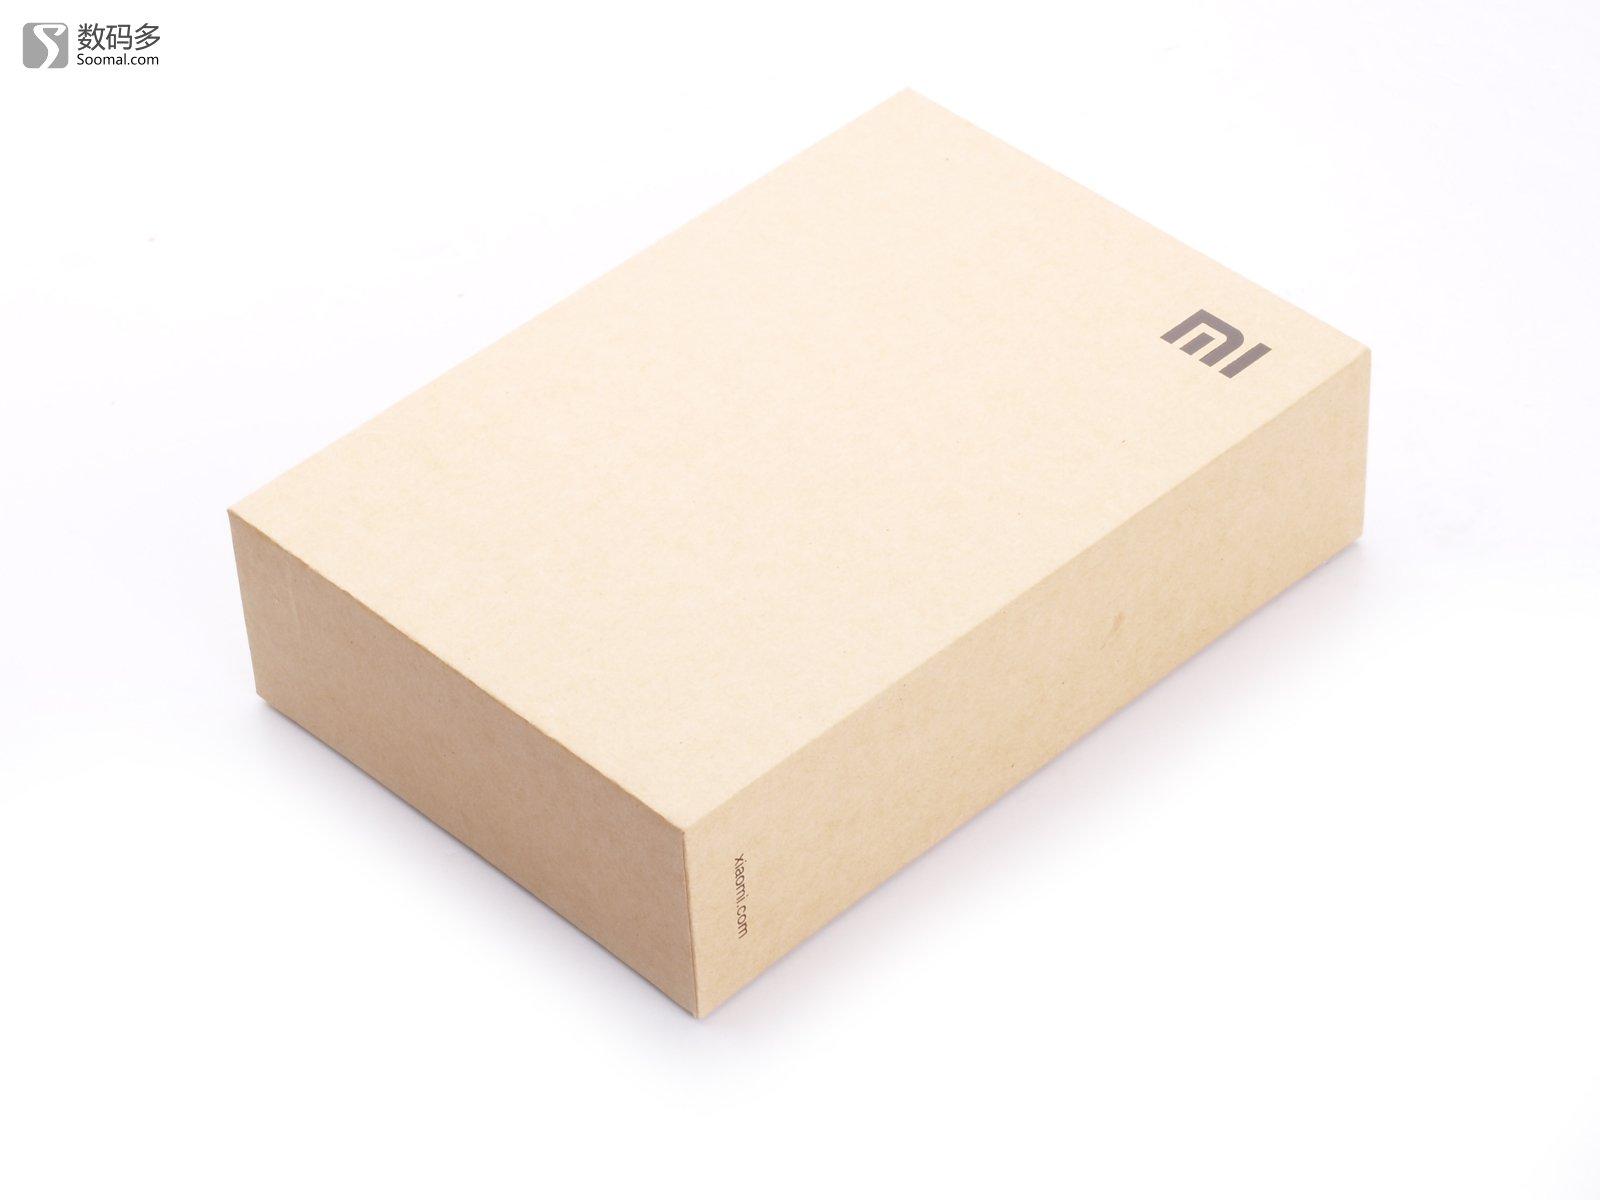 xiaomi 小米 小米盒子   包装图片